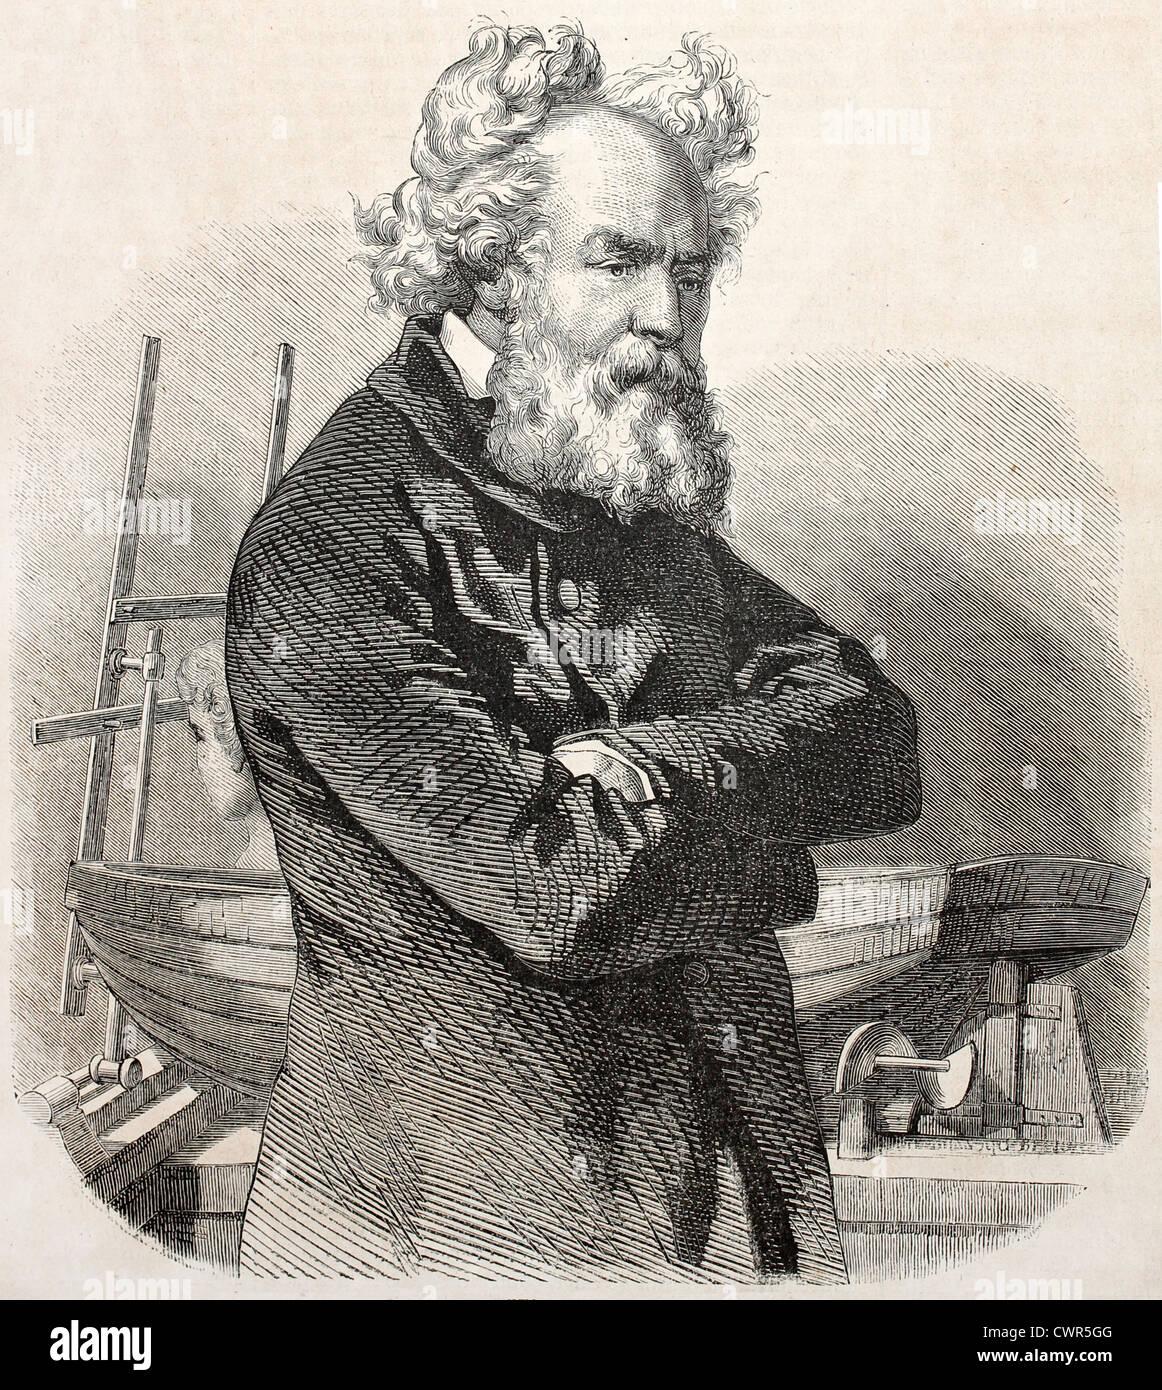 Pierre Louis Frederic Sauvage Immagini Stock